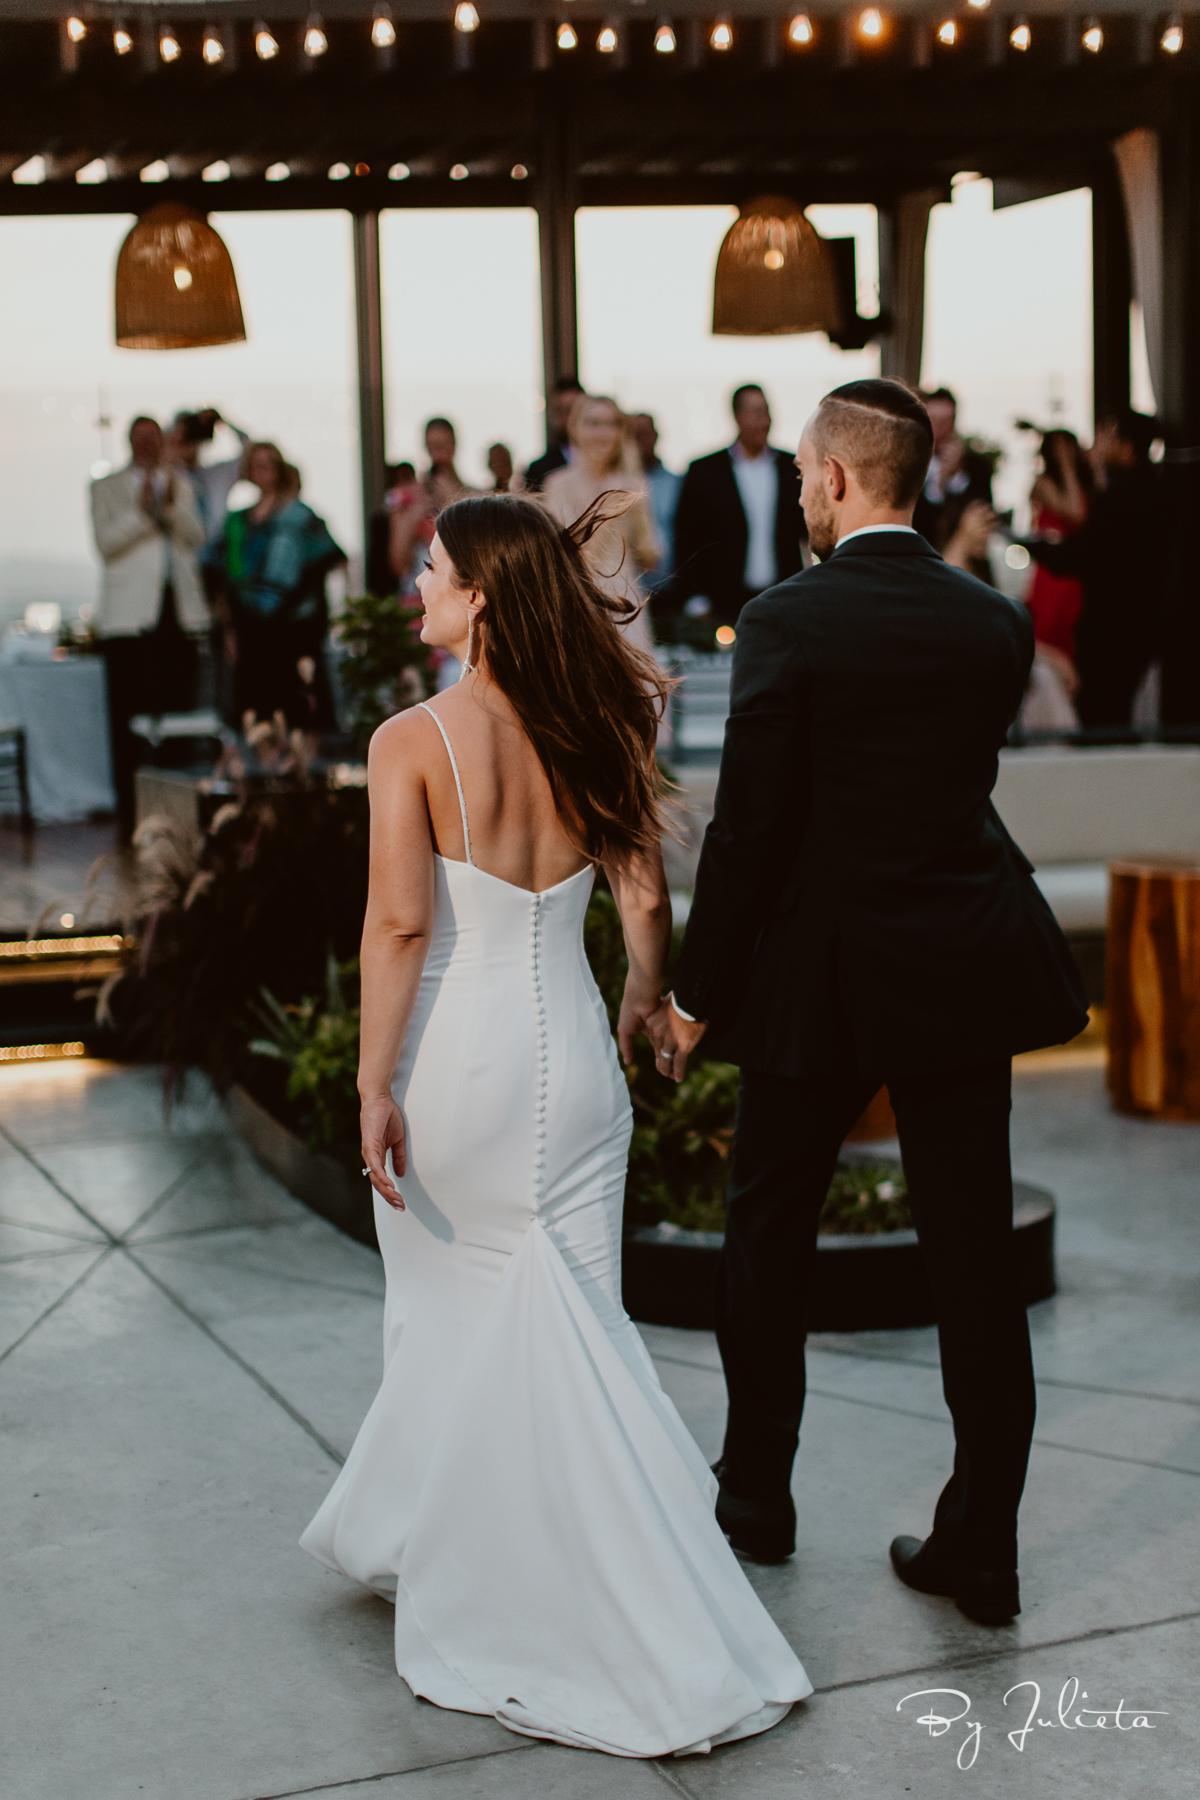 WeddingTheCapeCabo.B+G.JulietaAmezcuaPhotography.(470of533).jpg